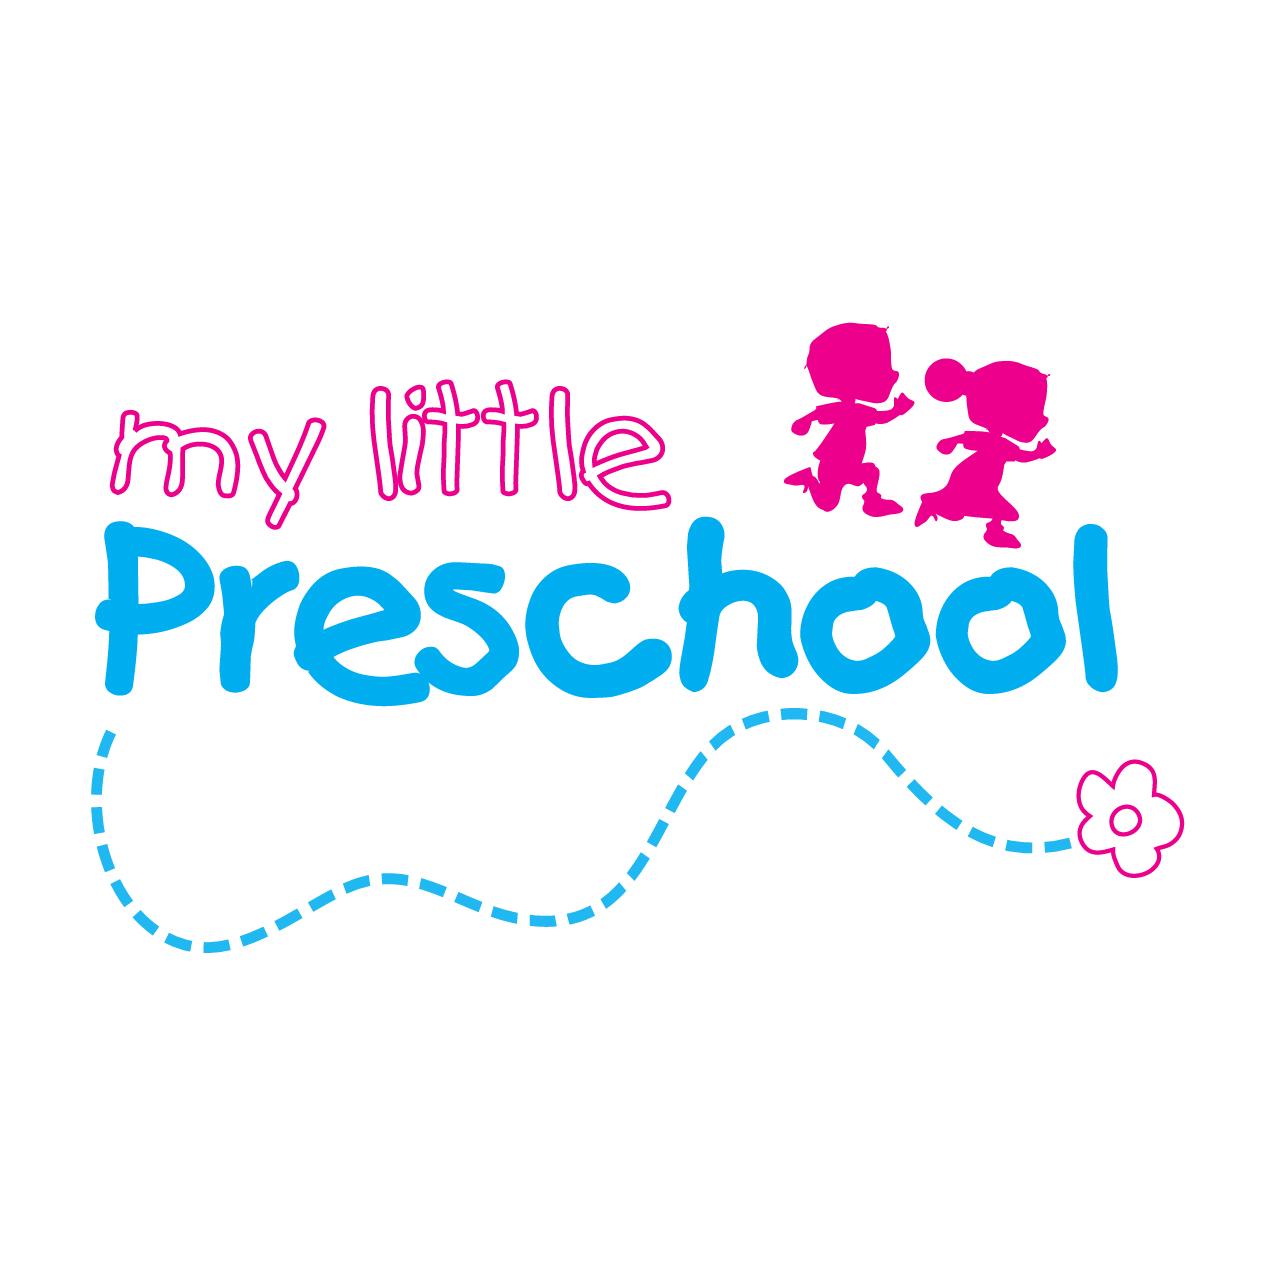 preschool kids logo template rh serenaking com preschool logo display preschool logo ideas